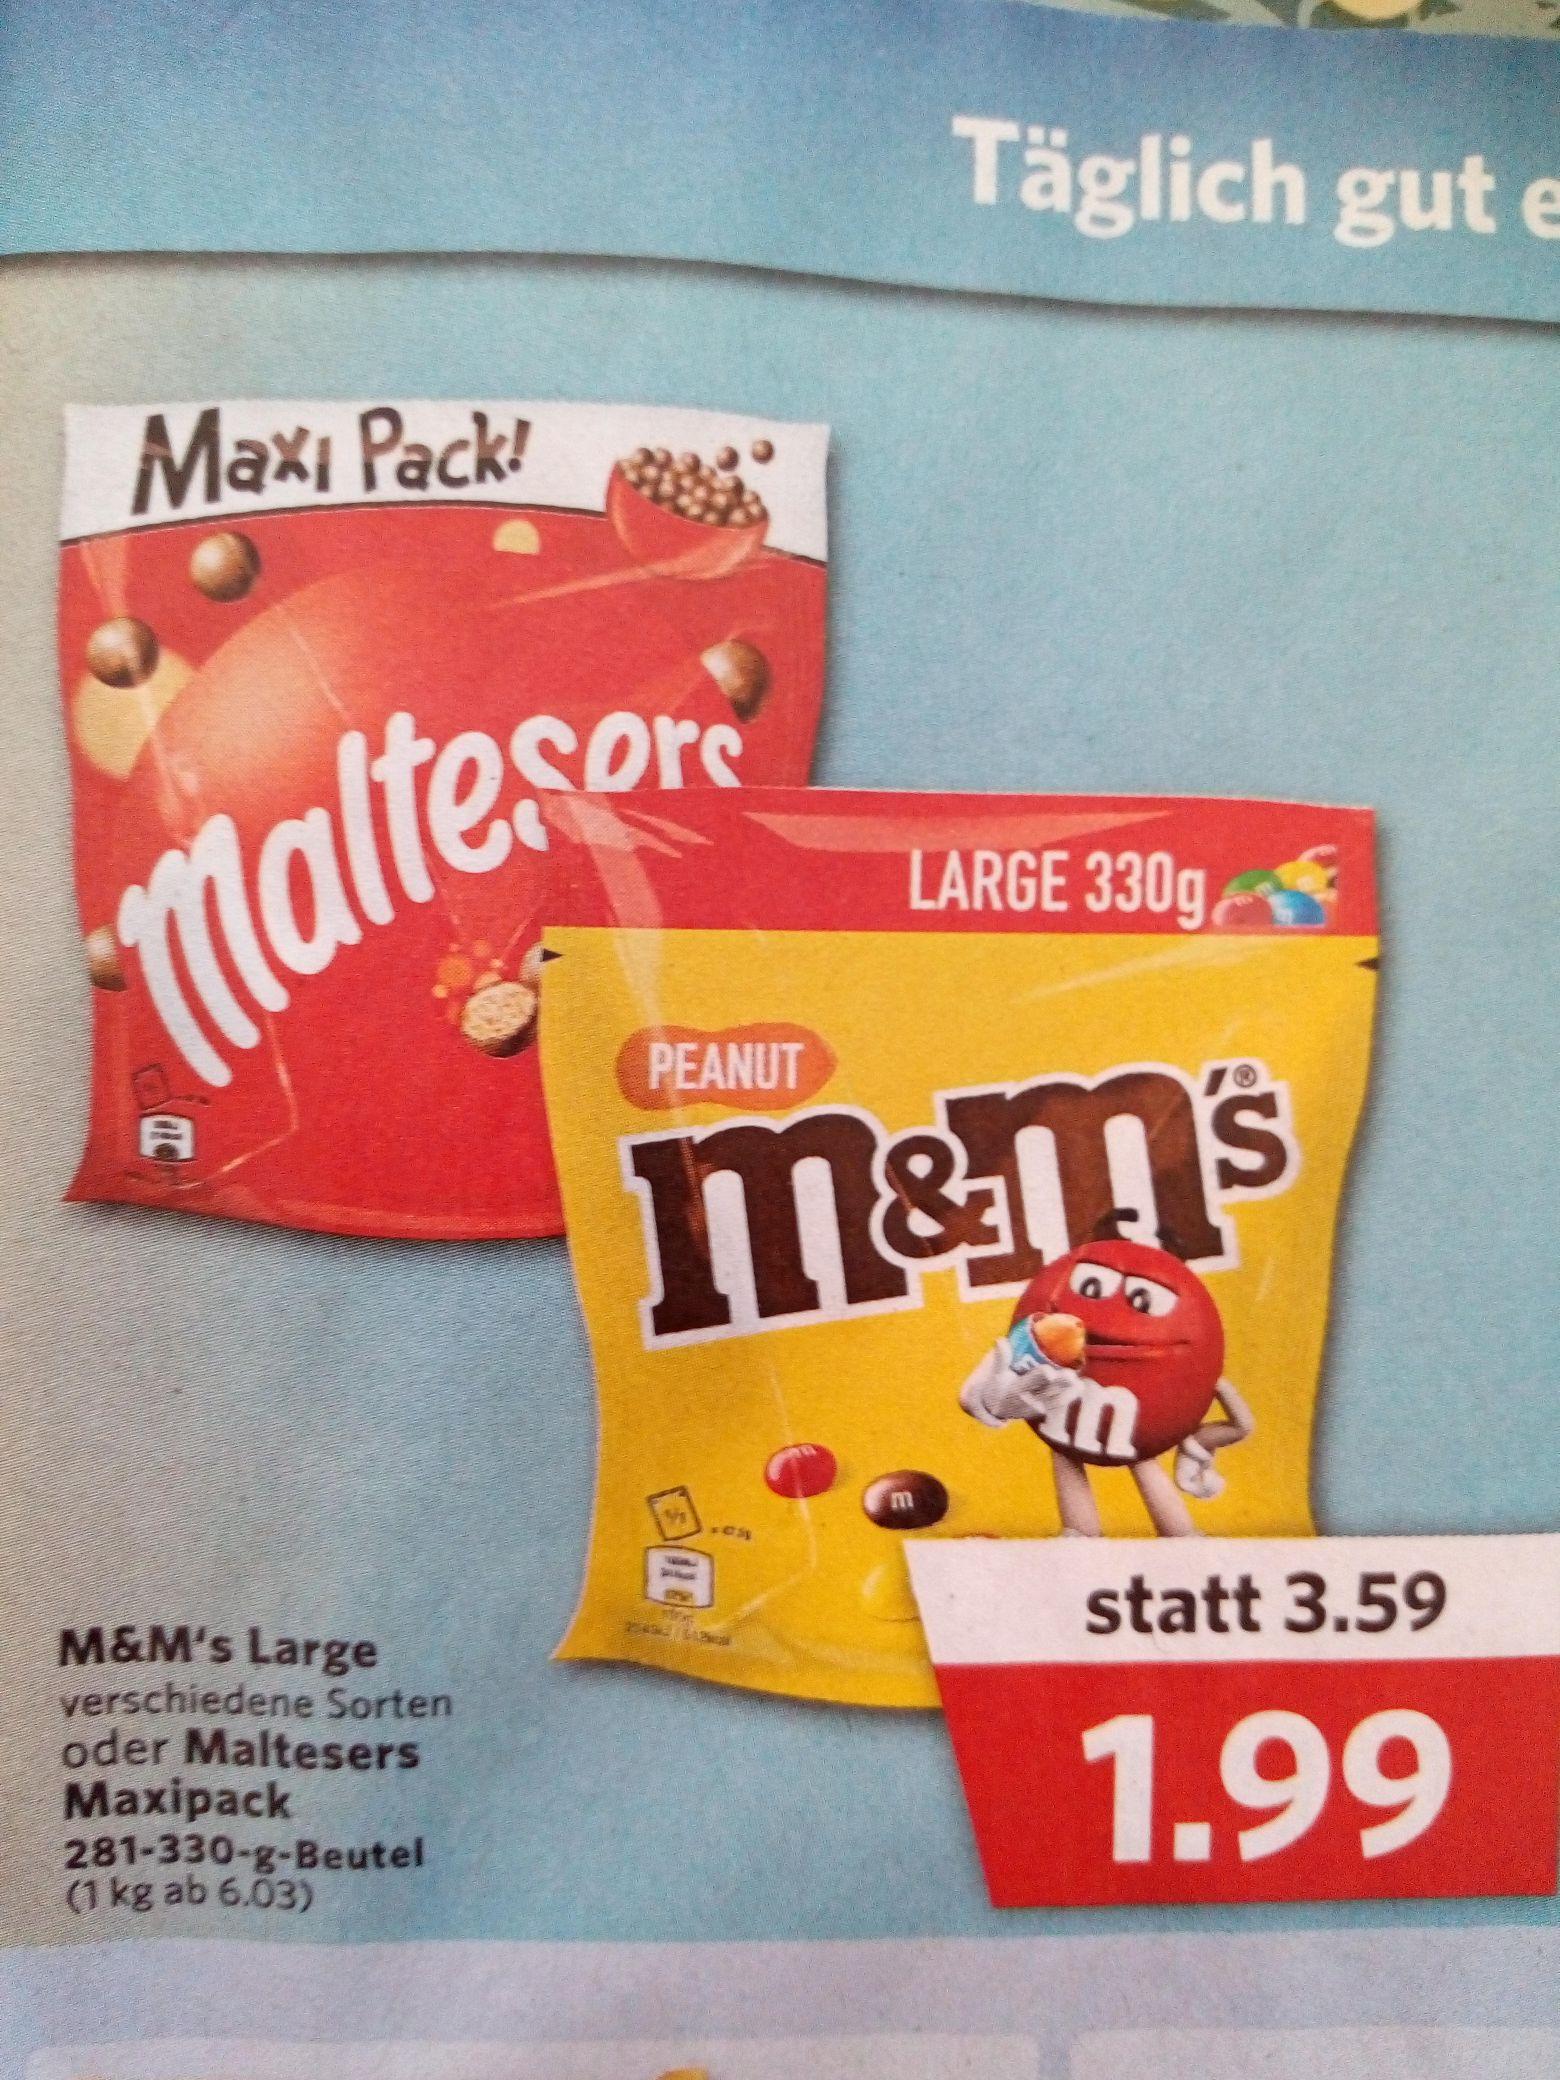 M&M's Large Ver Sorten und Maltesers Maxipack